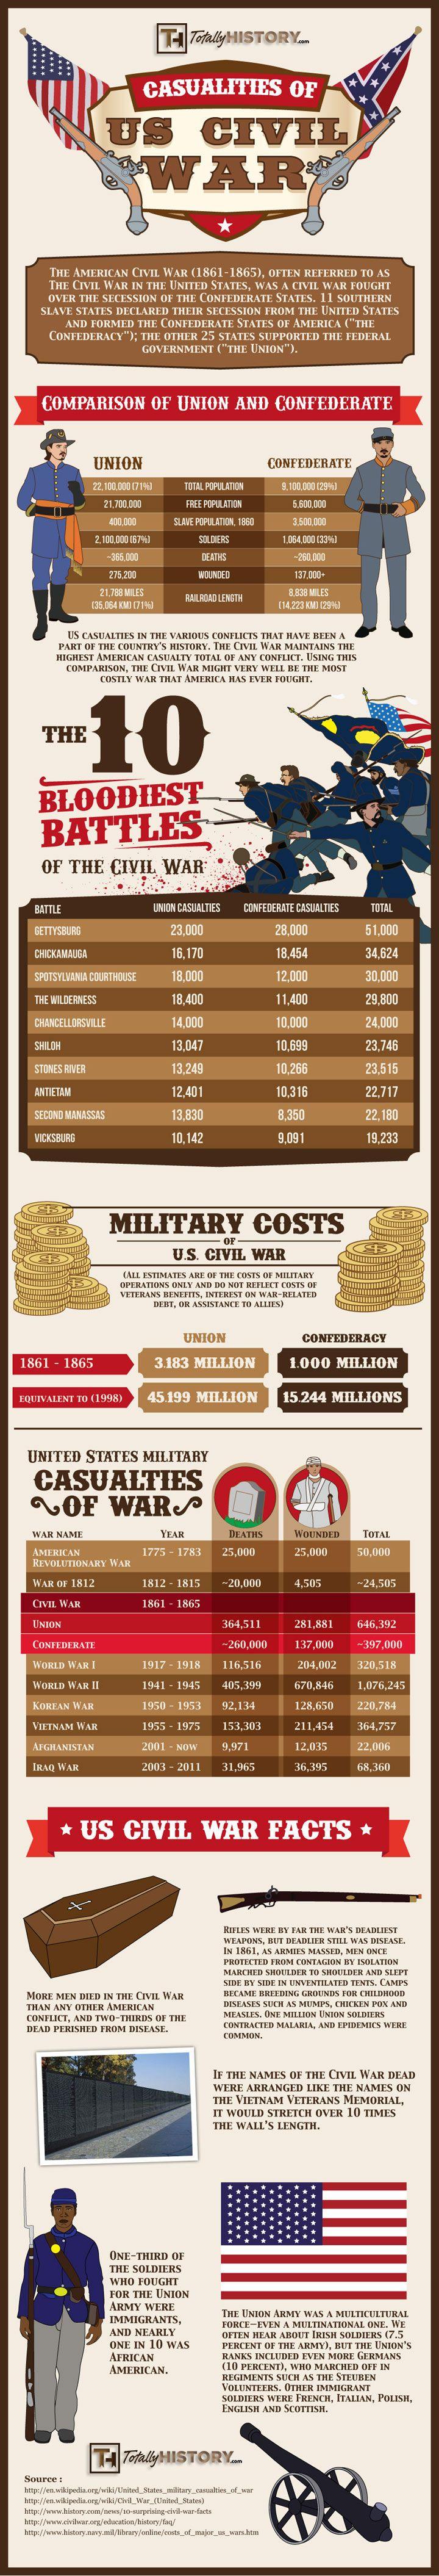 U.S. Civil War Casualties Statistics – Deaths Comparison of Battles